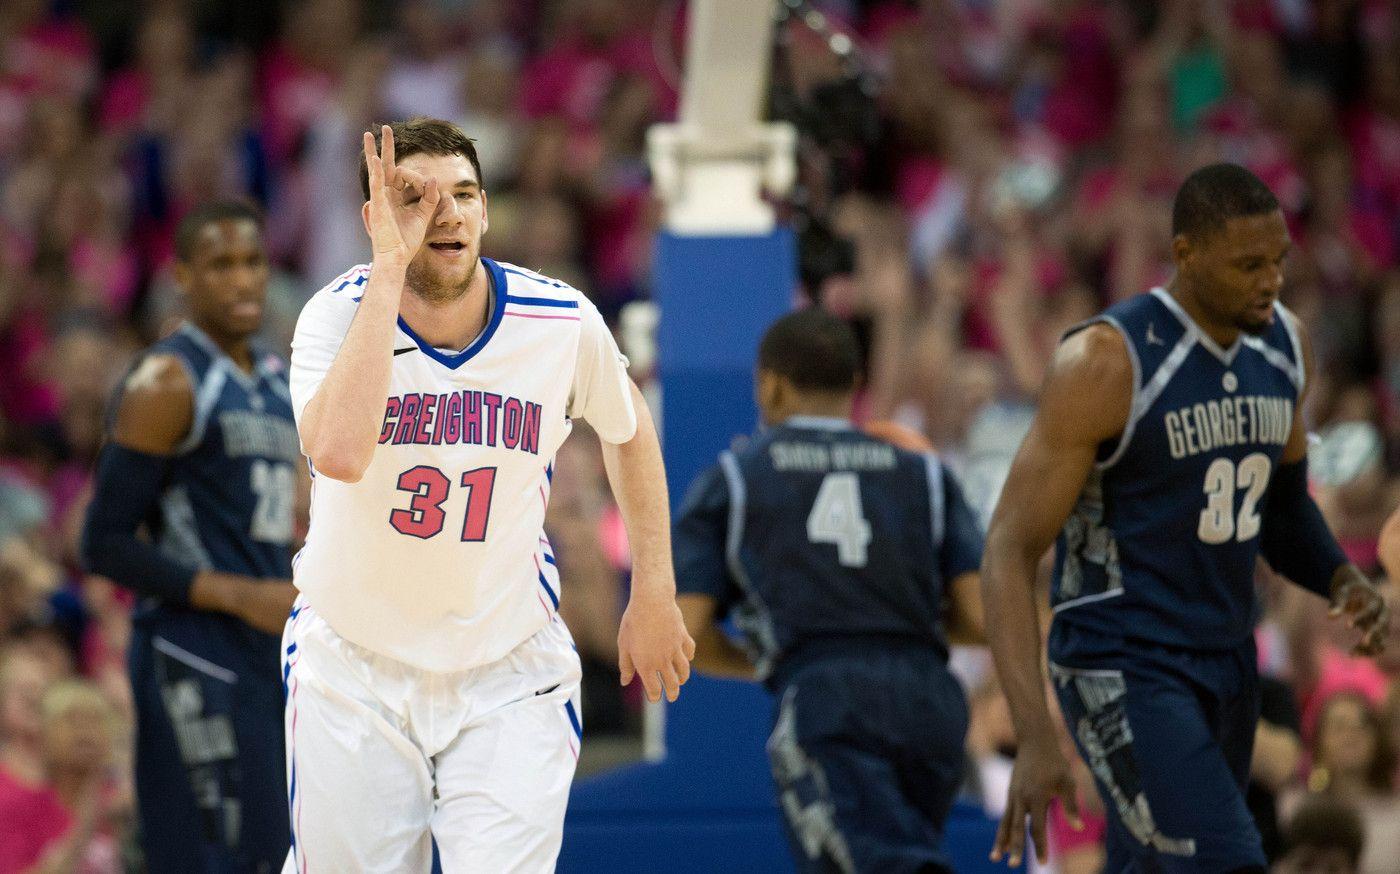 Creighton's Will Artino signals to teammate Jahenns